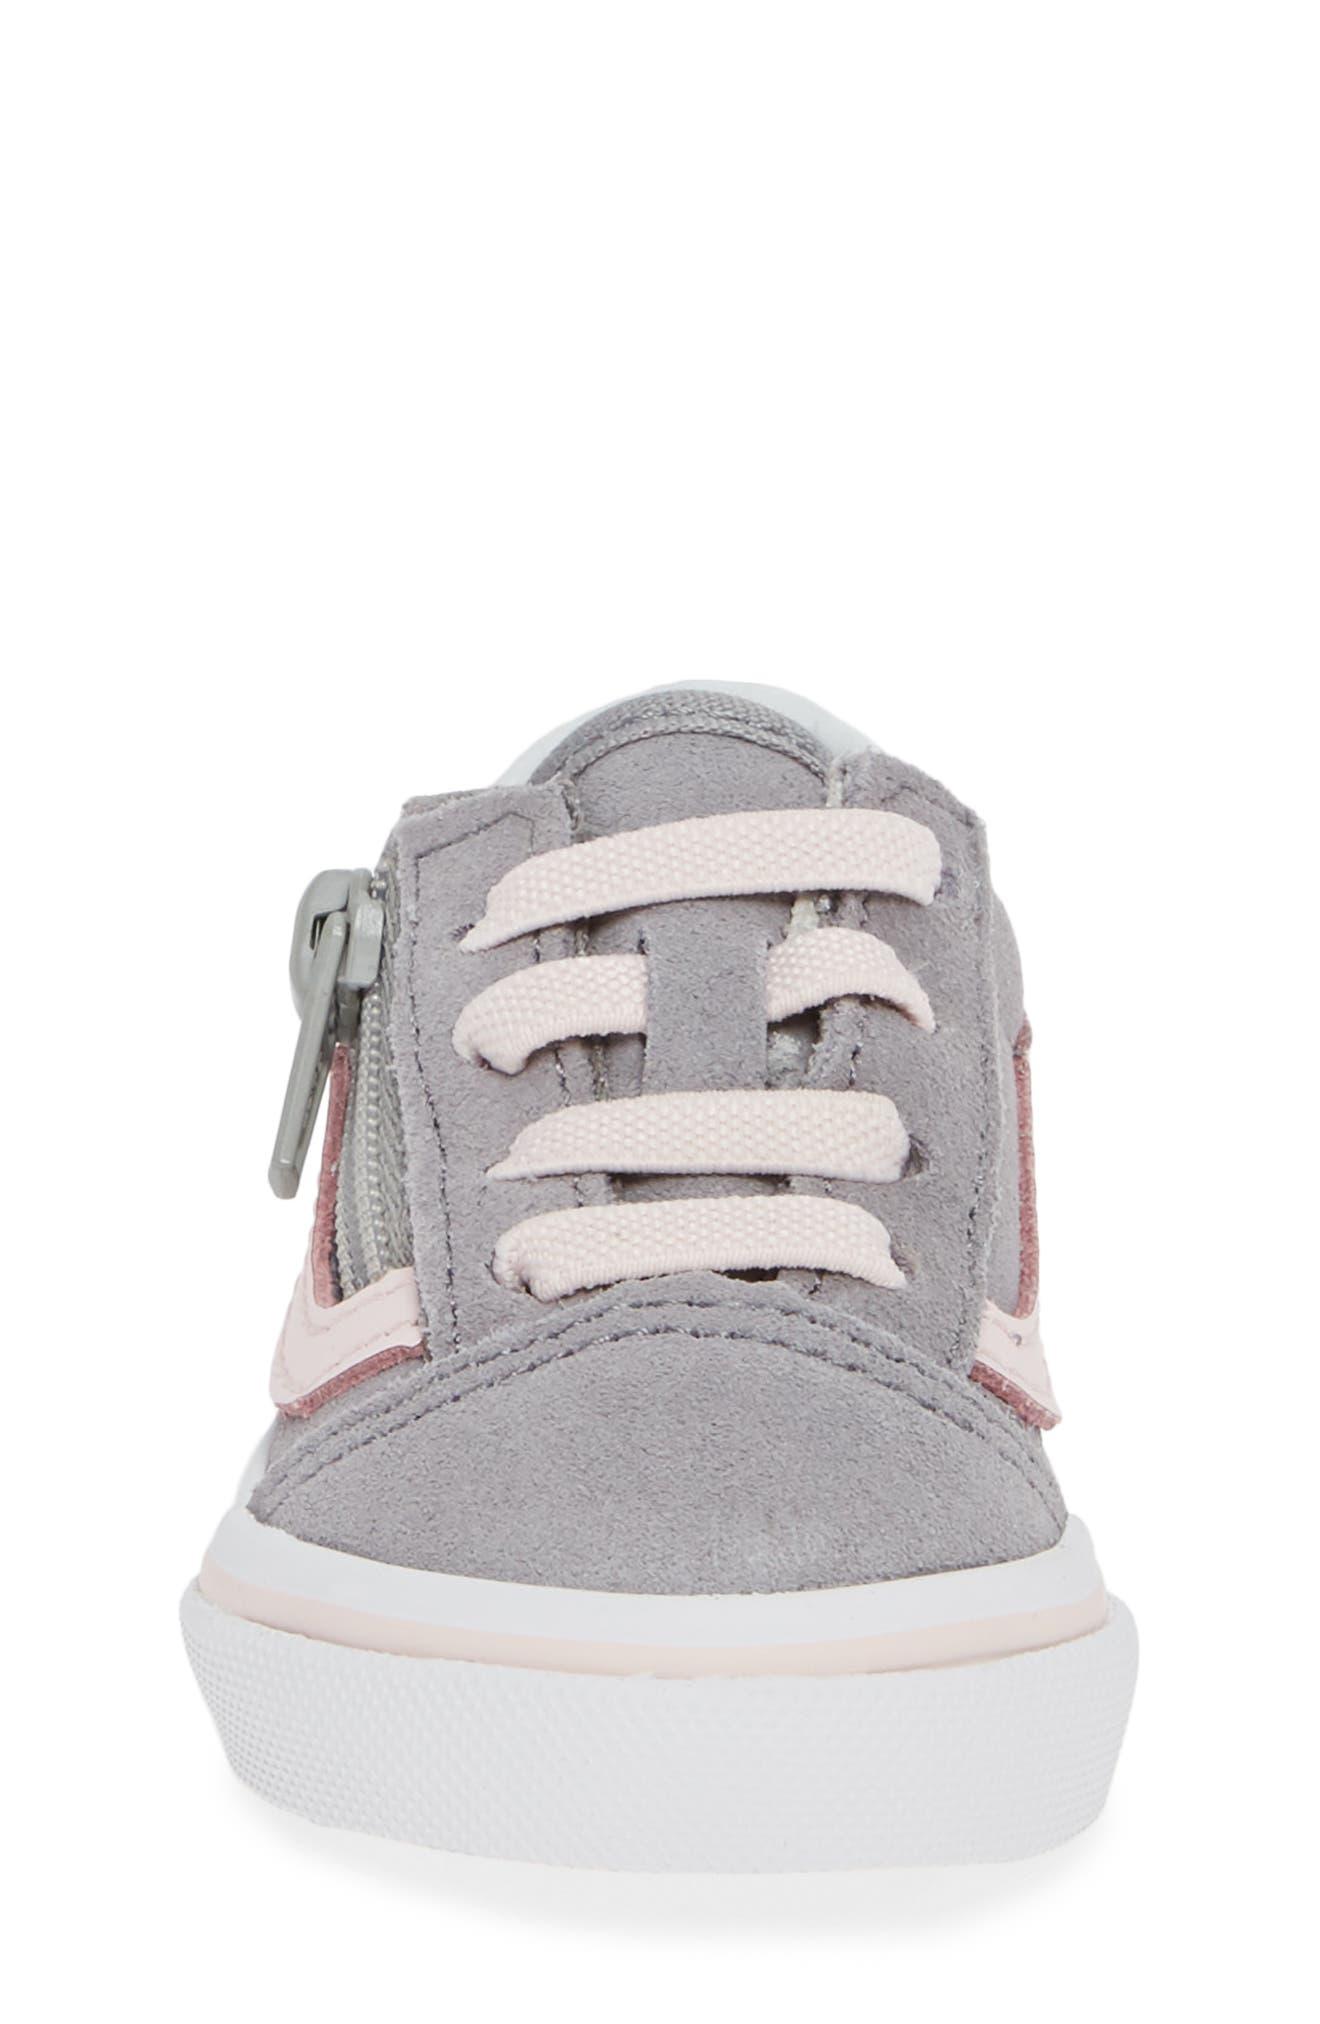 Old Skool Zip Sneaker,                             Alternate thumbnail 4, color,                             SUEDE ALLOY/ PINK/ TRUE WHITE